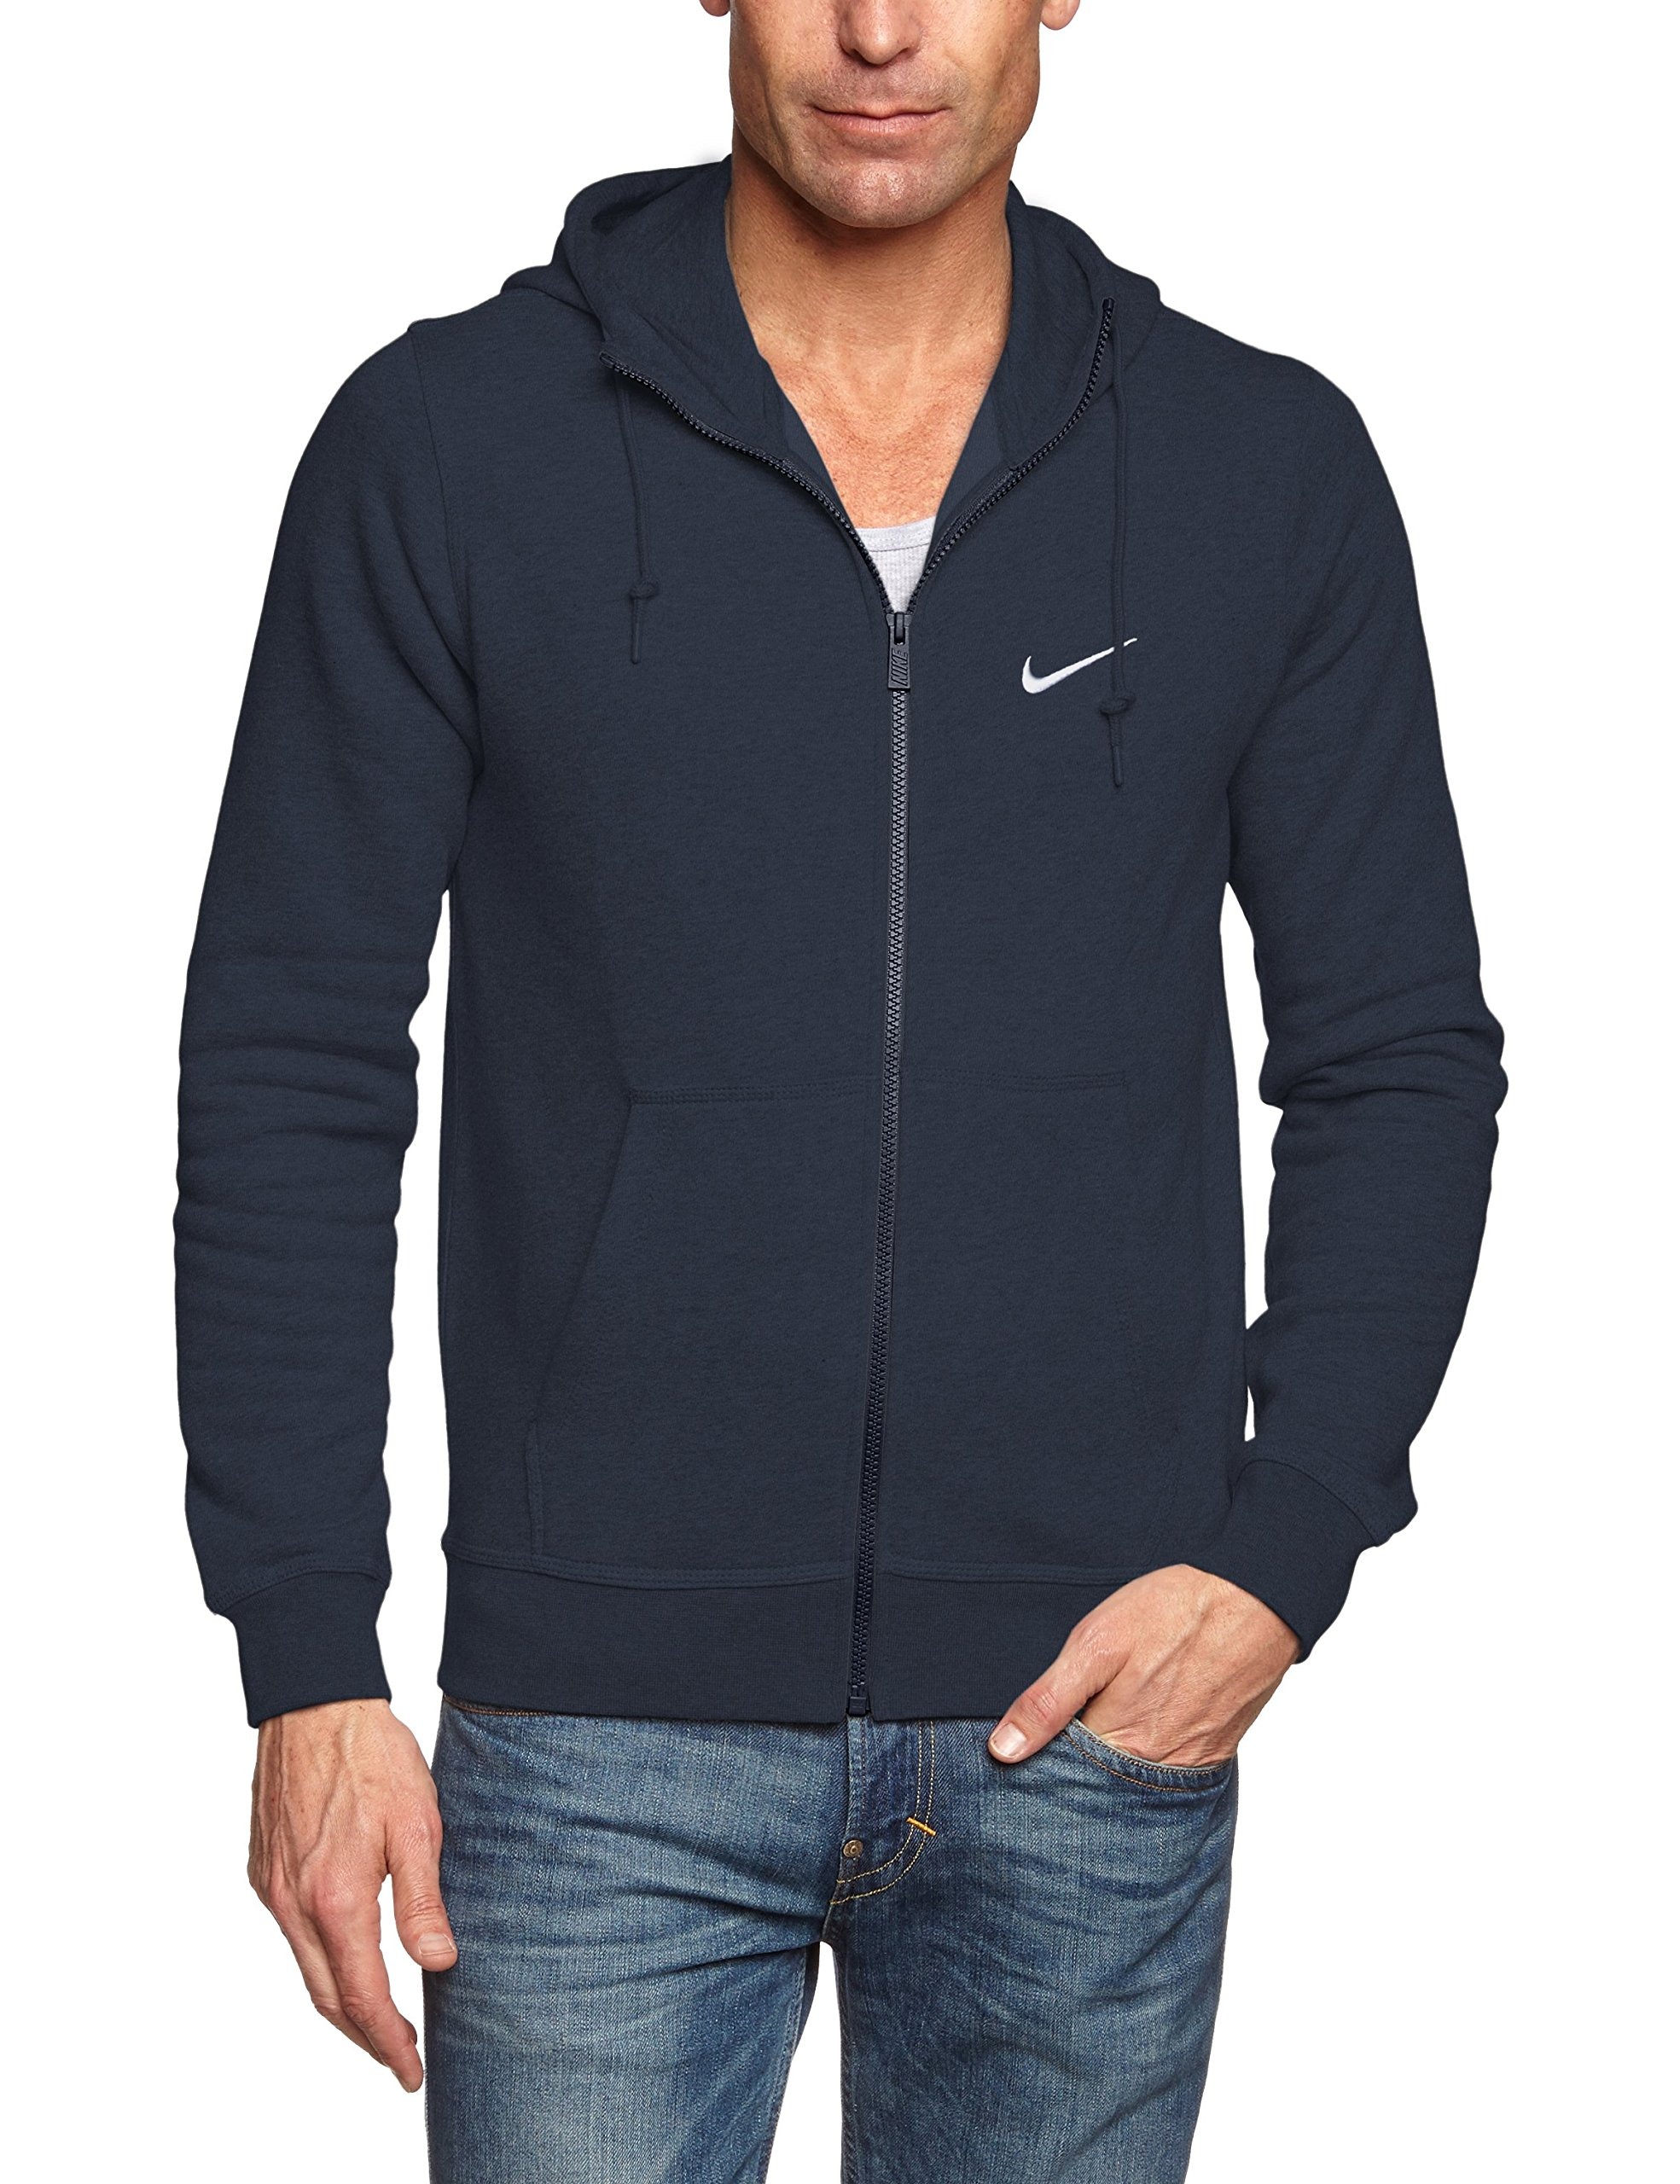 Nike Mens Club FZ Hoodie Obsidian Navy Blue/White 611456-473 Size X-Large